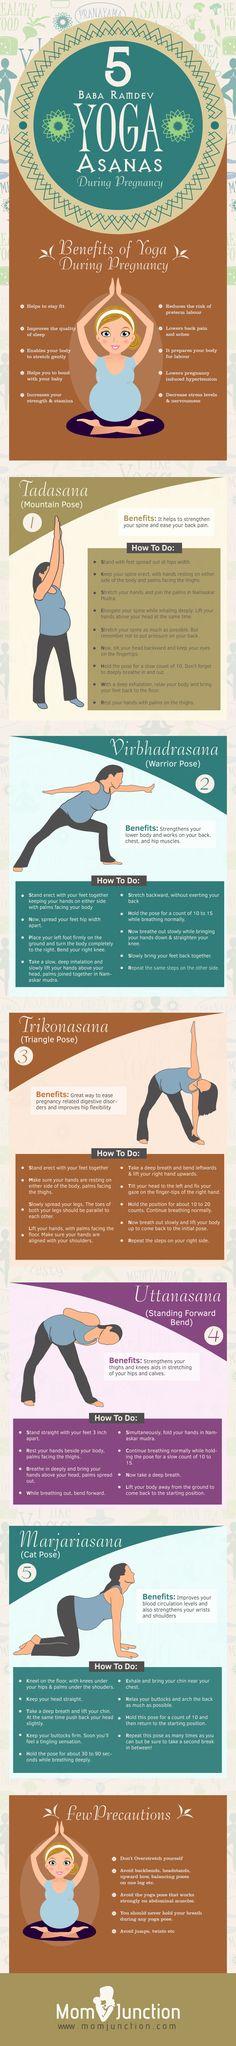 6 Effective Baba Ramdev Yoga Asanas For Pregnant Women